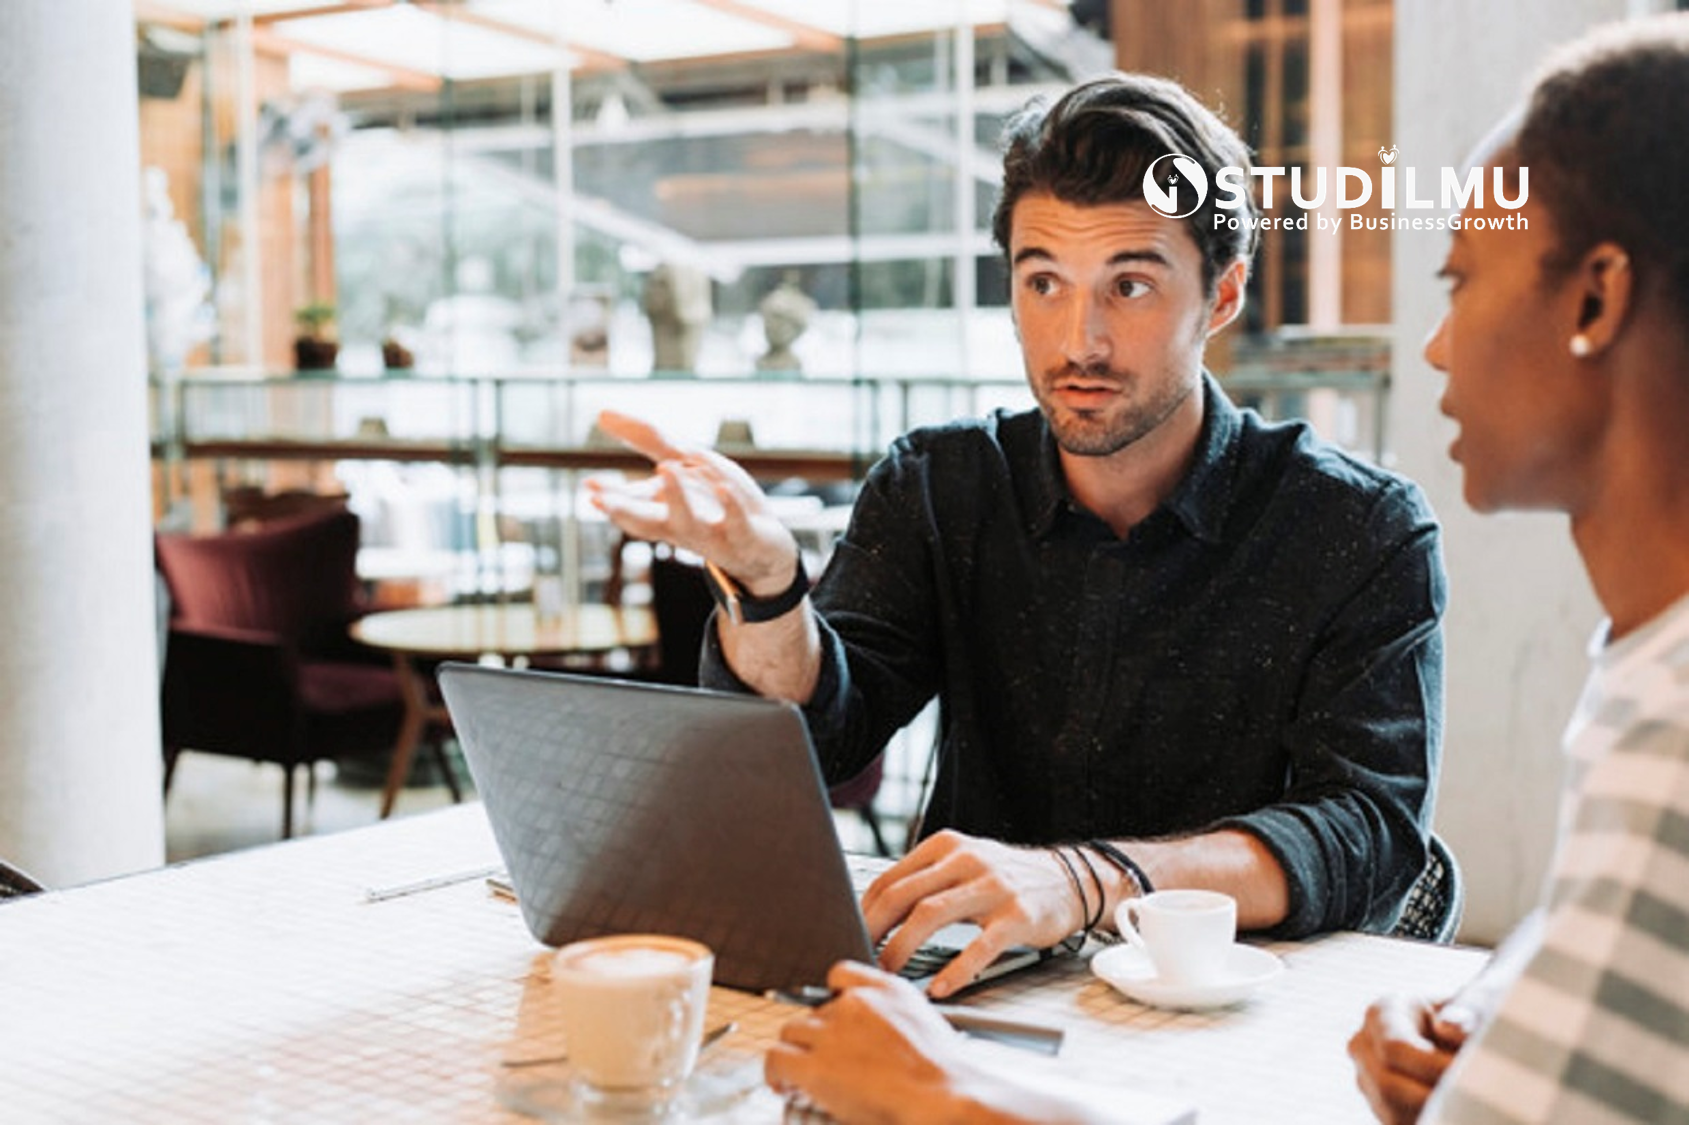 STUDILMU Career Advice - Memiliki Komunikasi Efektif